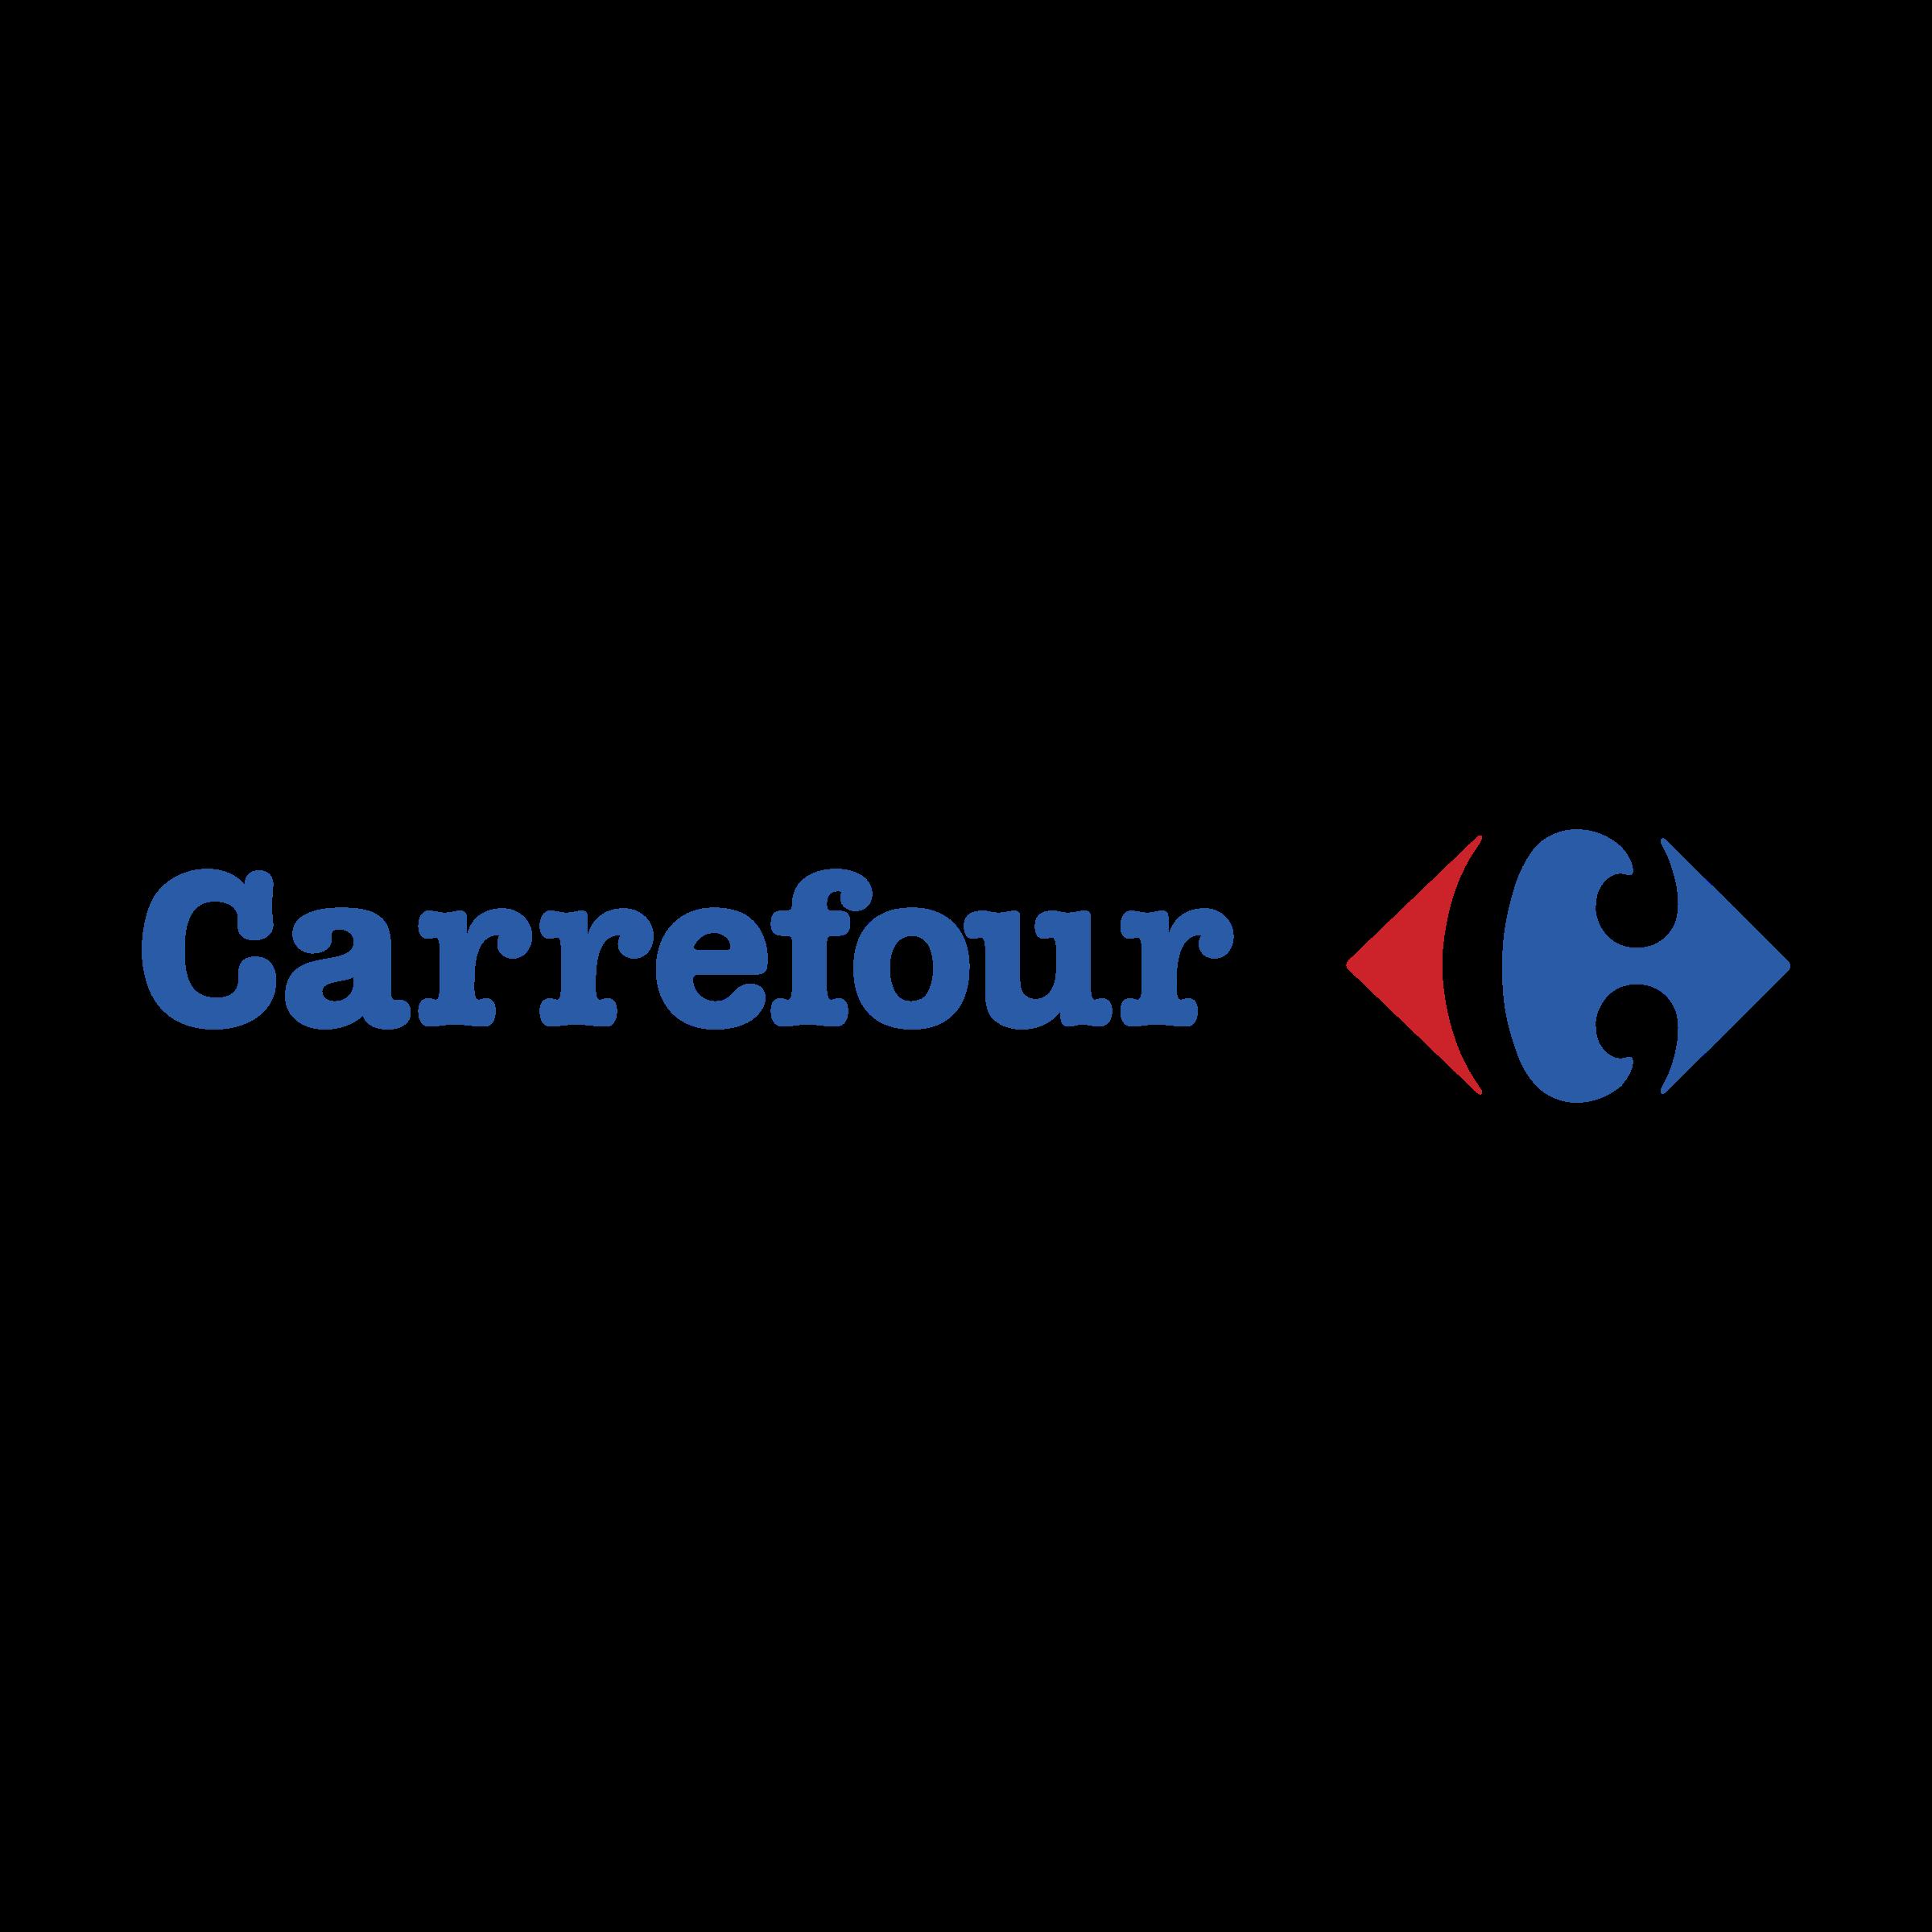 carrefour-1-logo-png-transparent